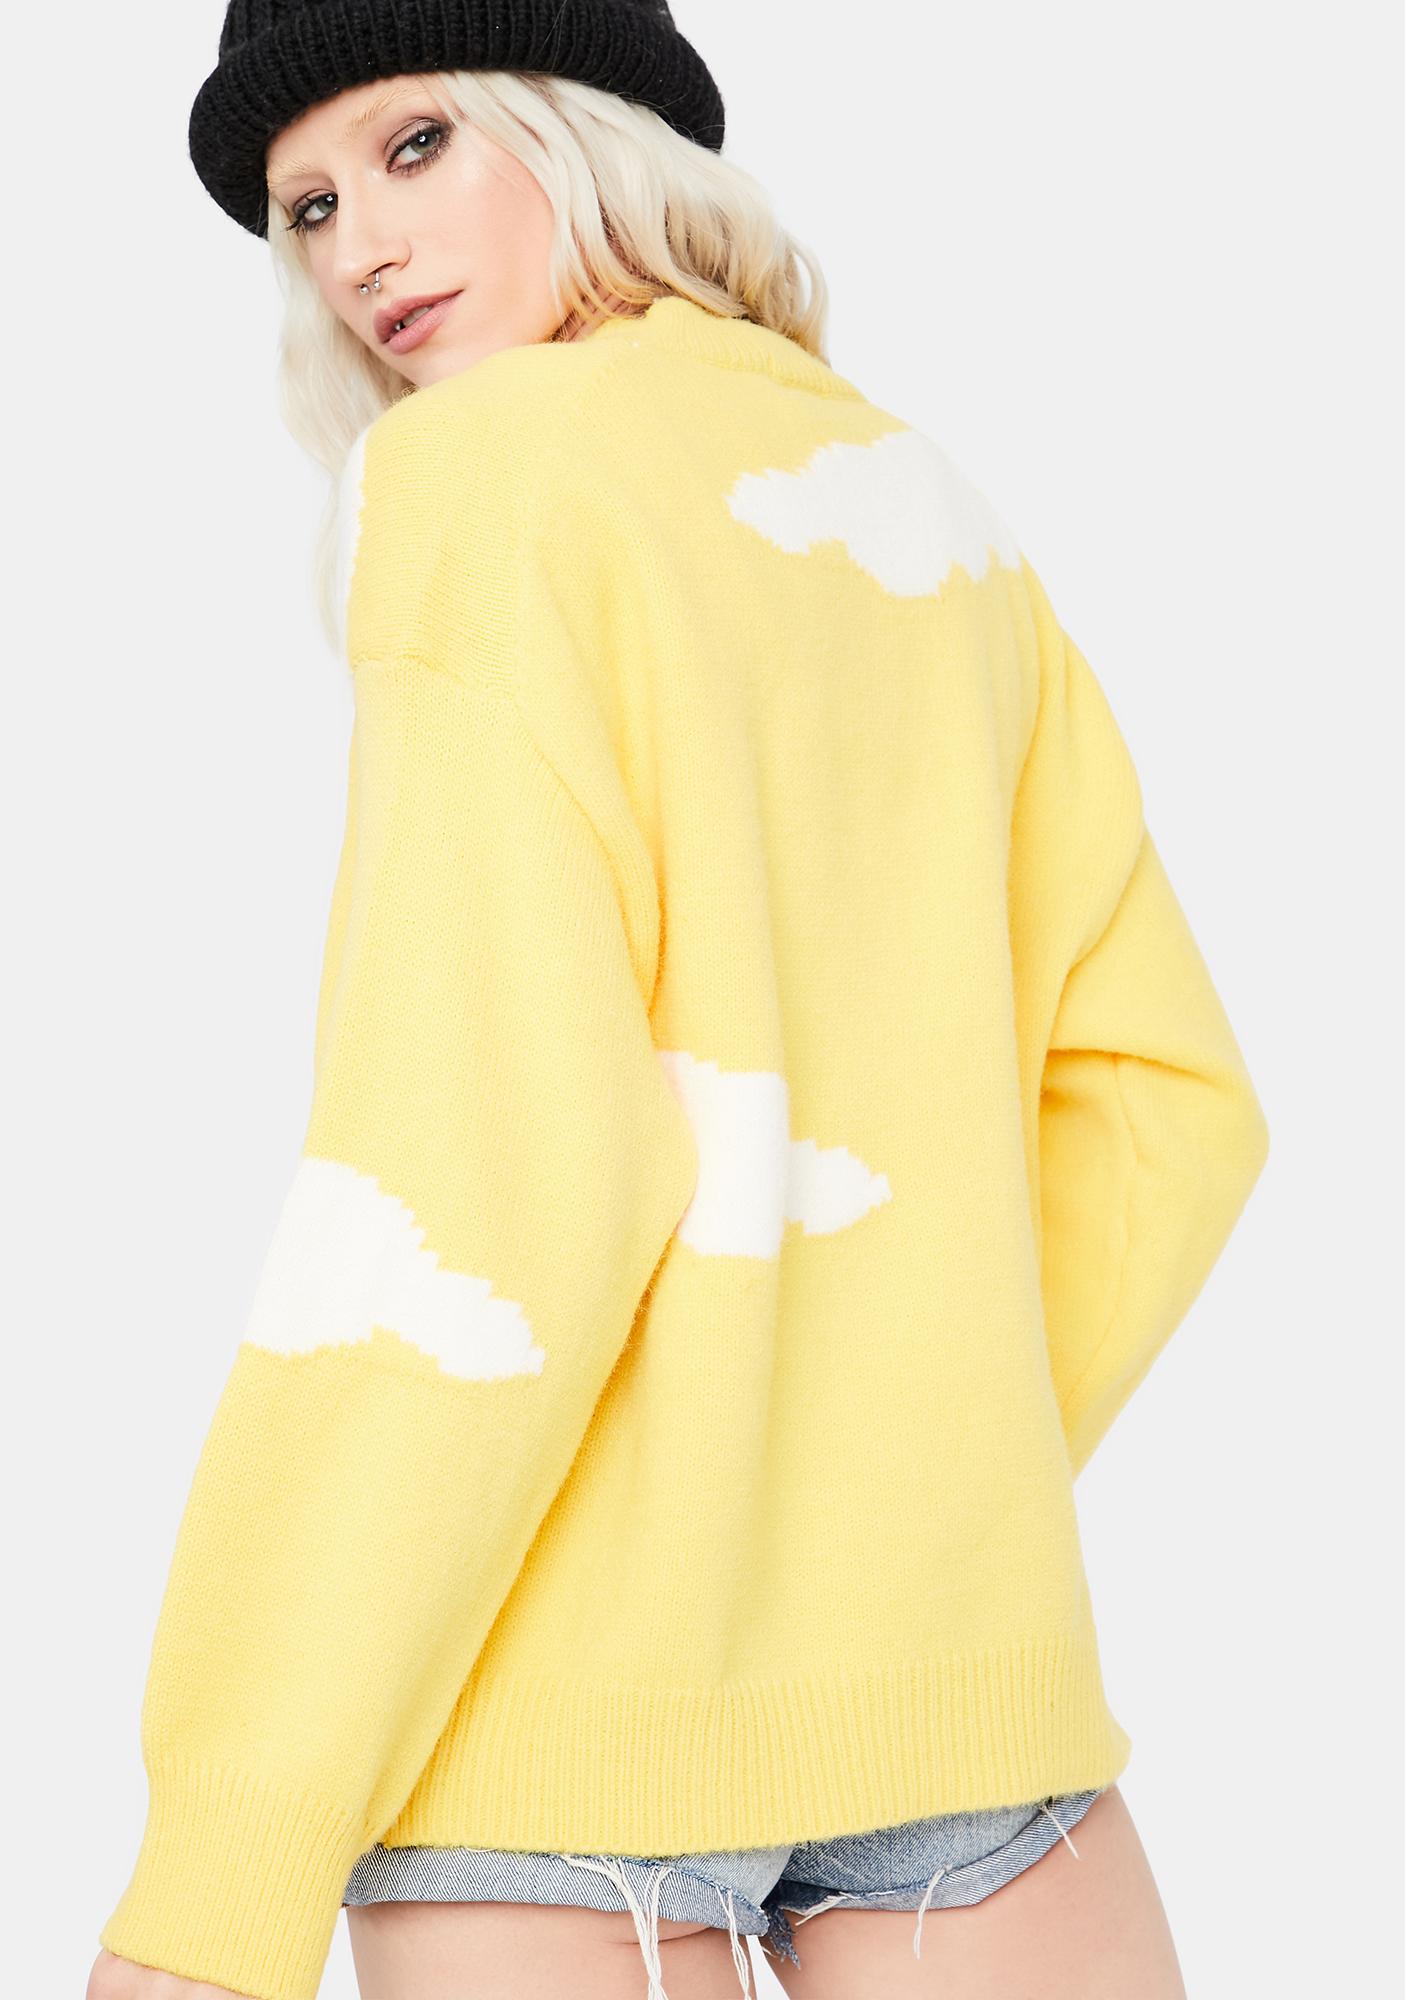 Honey When It Rains Cloud Knit Sweater